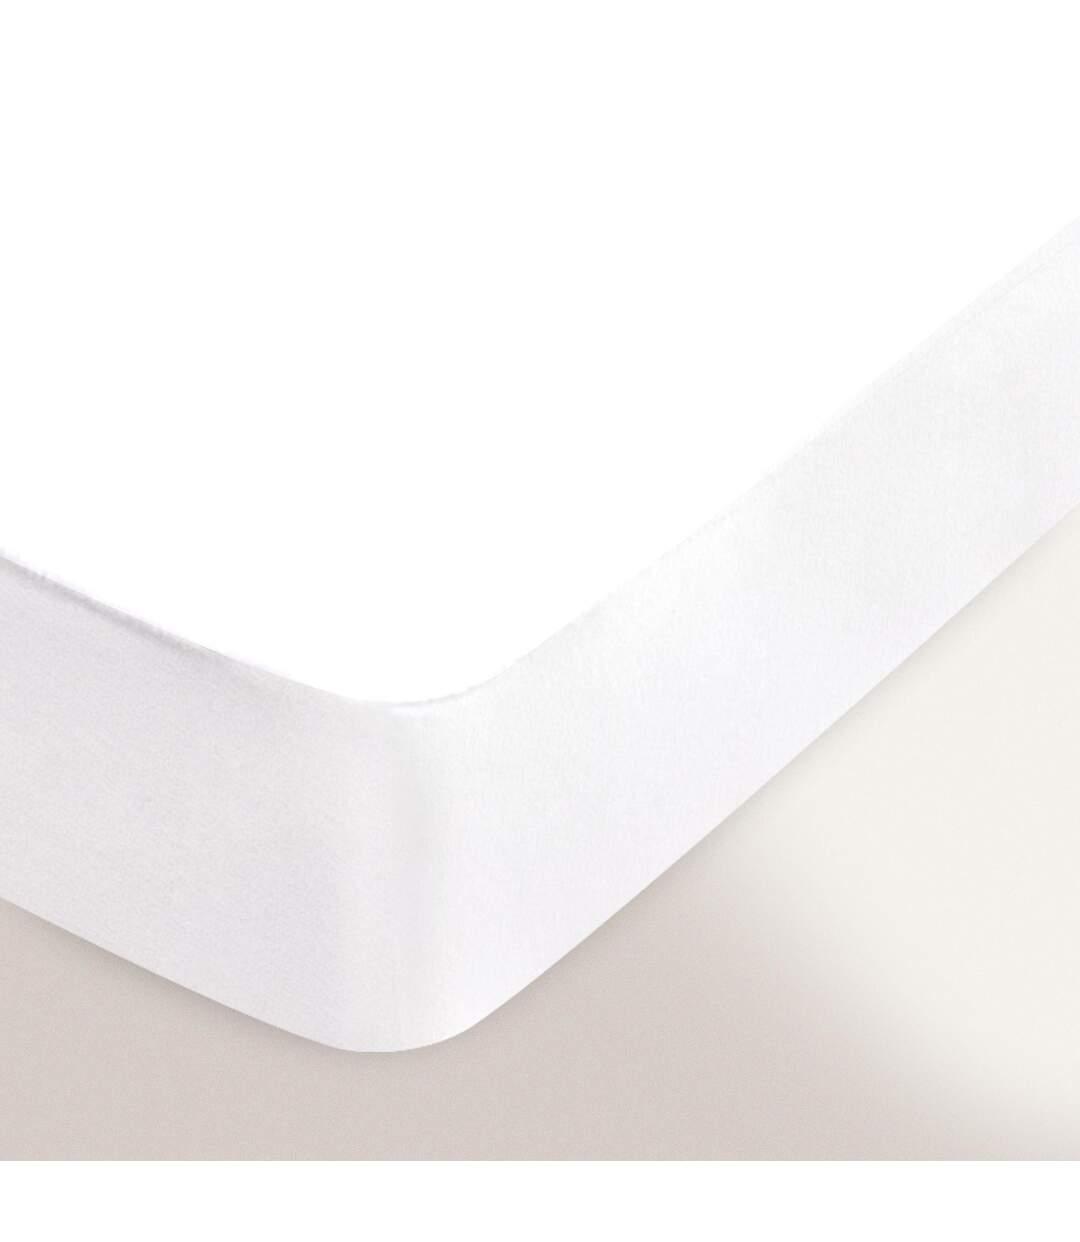 Protège matelas imperméable Antony blanc 130x200